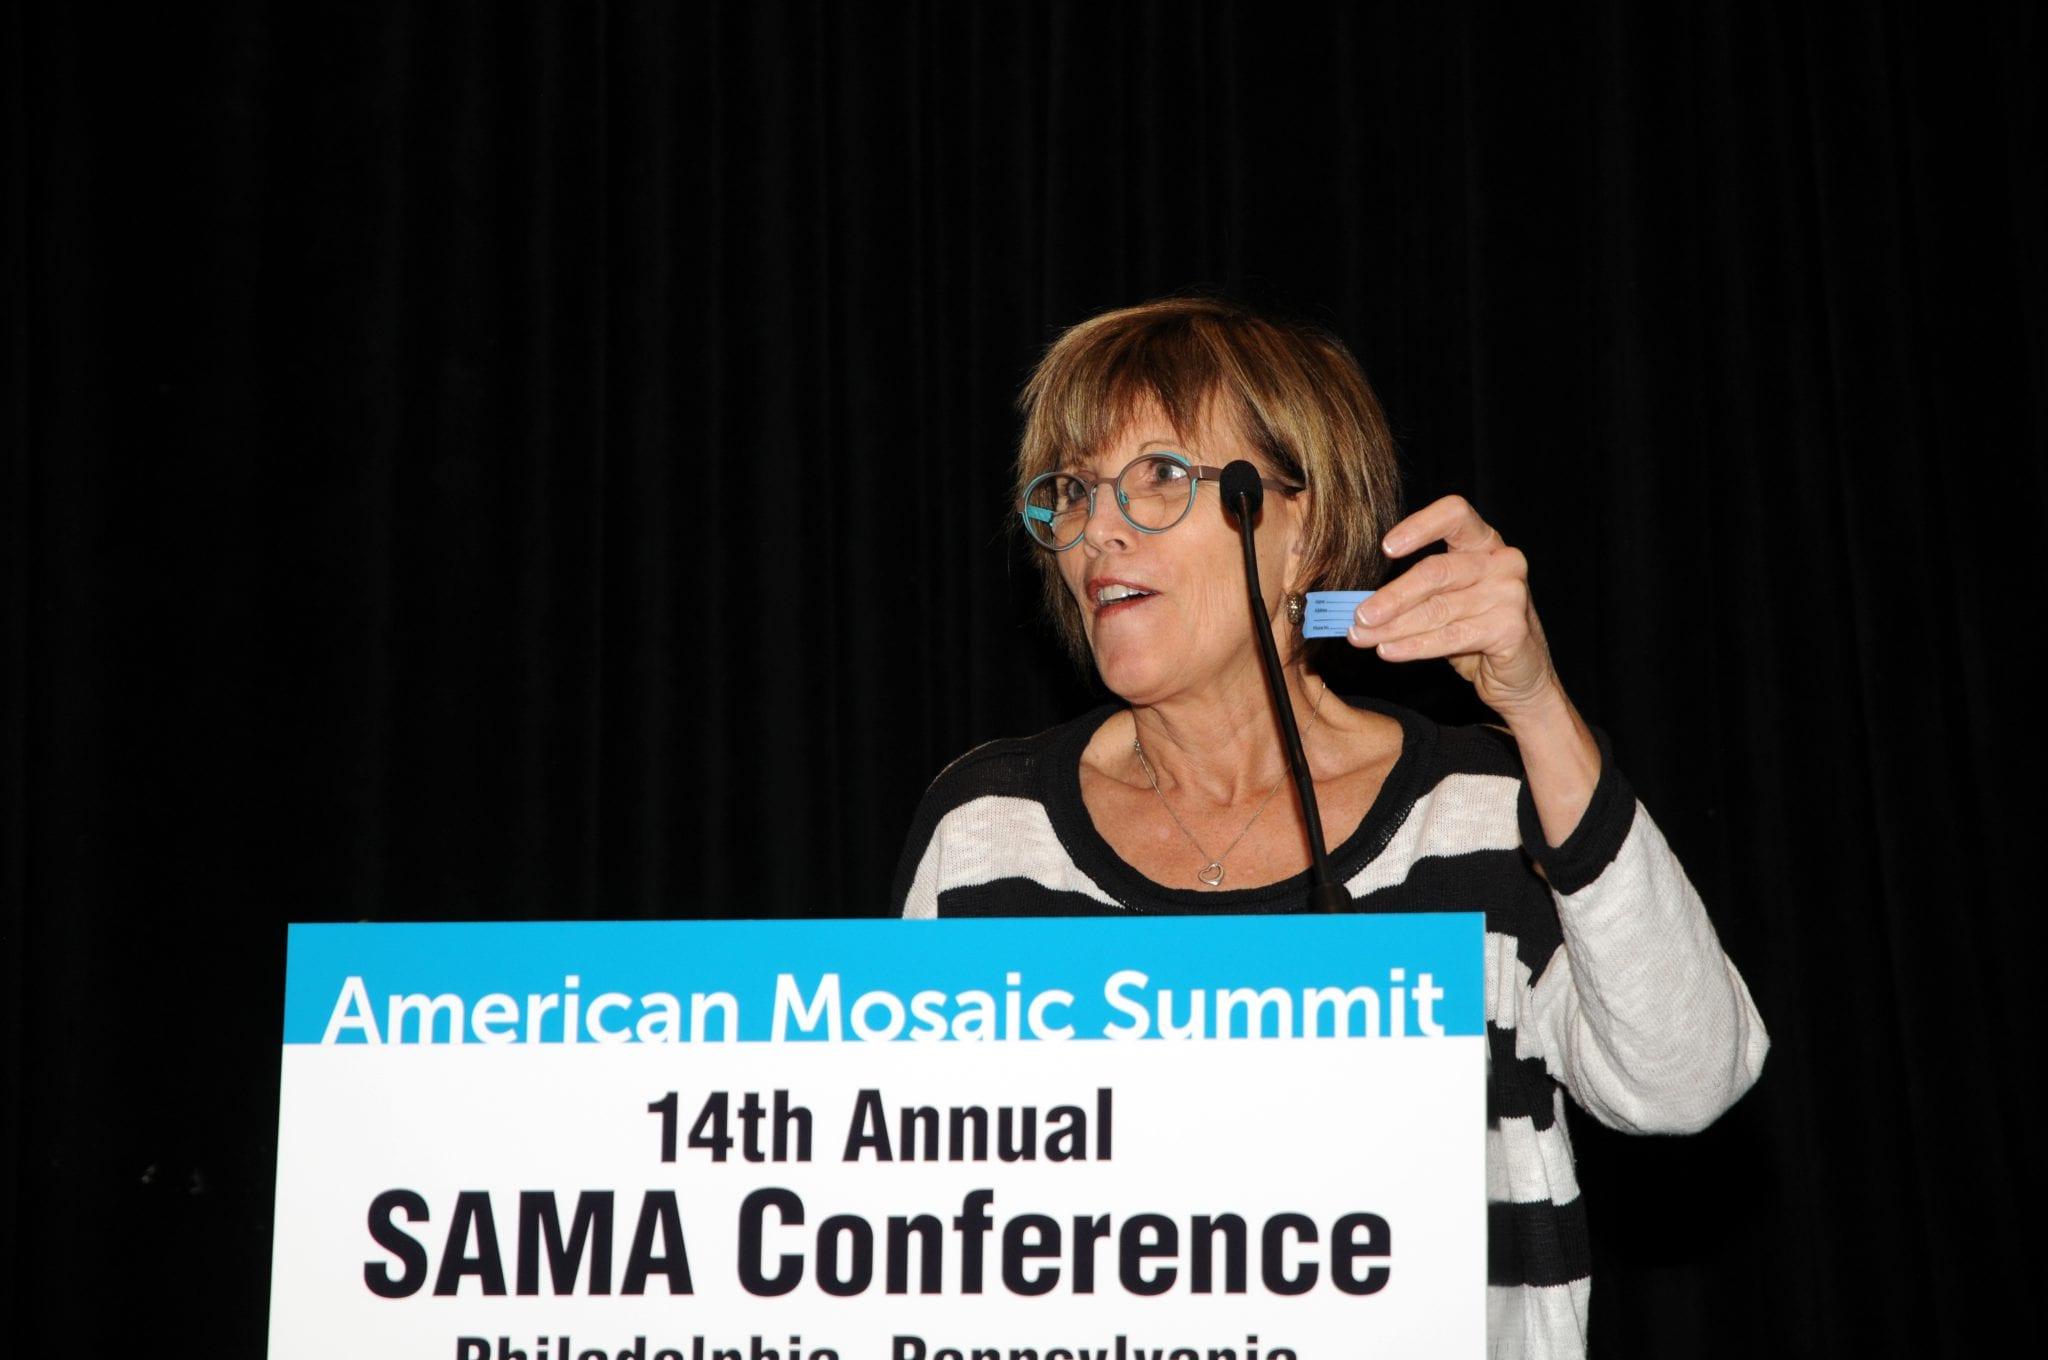 SAMA Philly2015 American Mosaic Summit